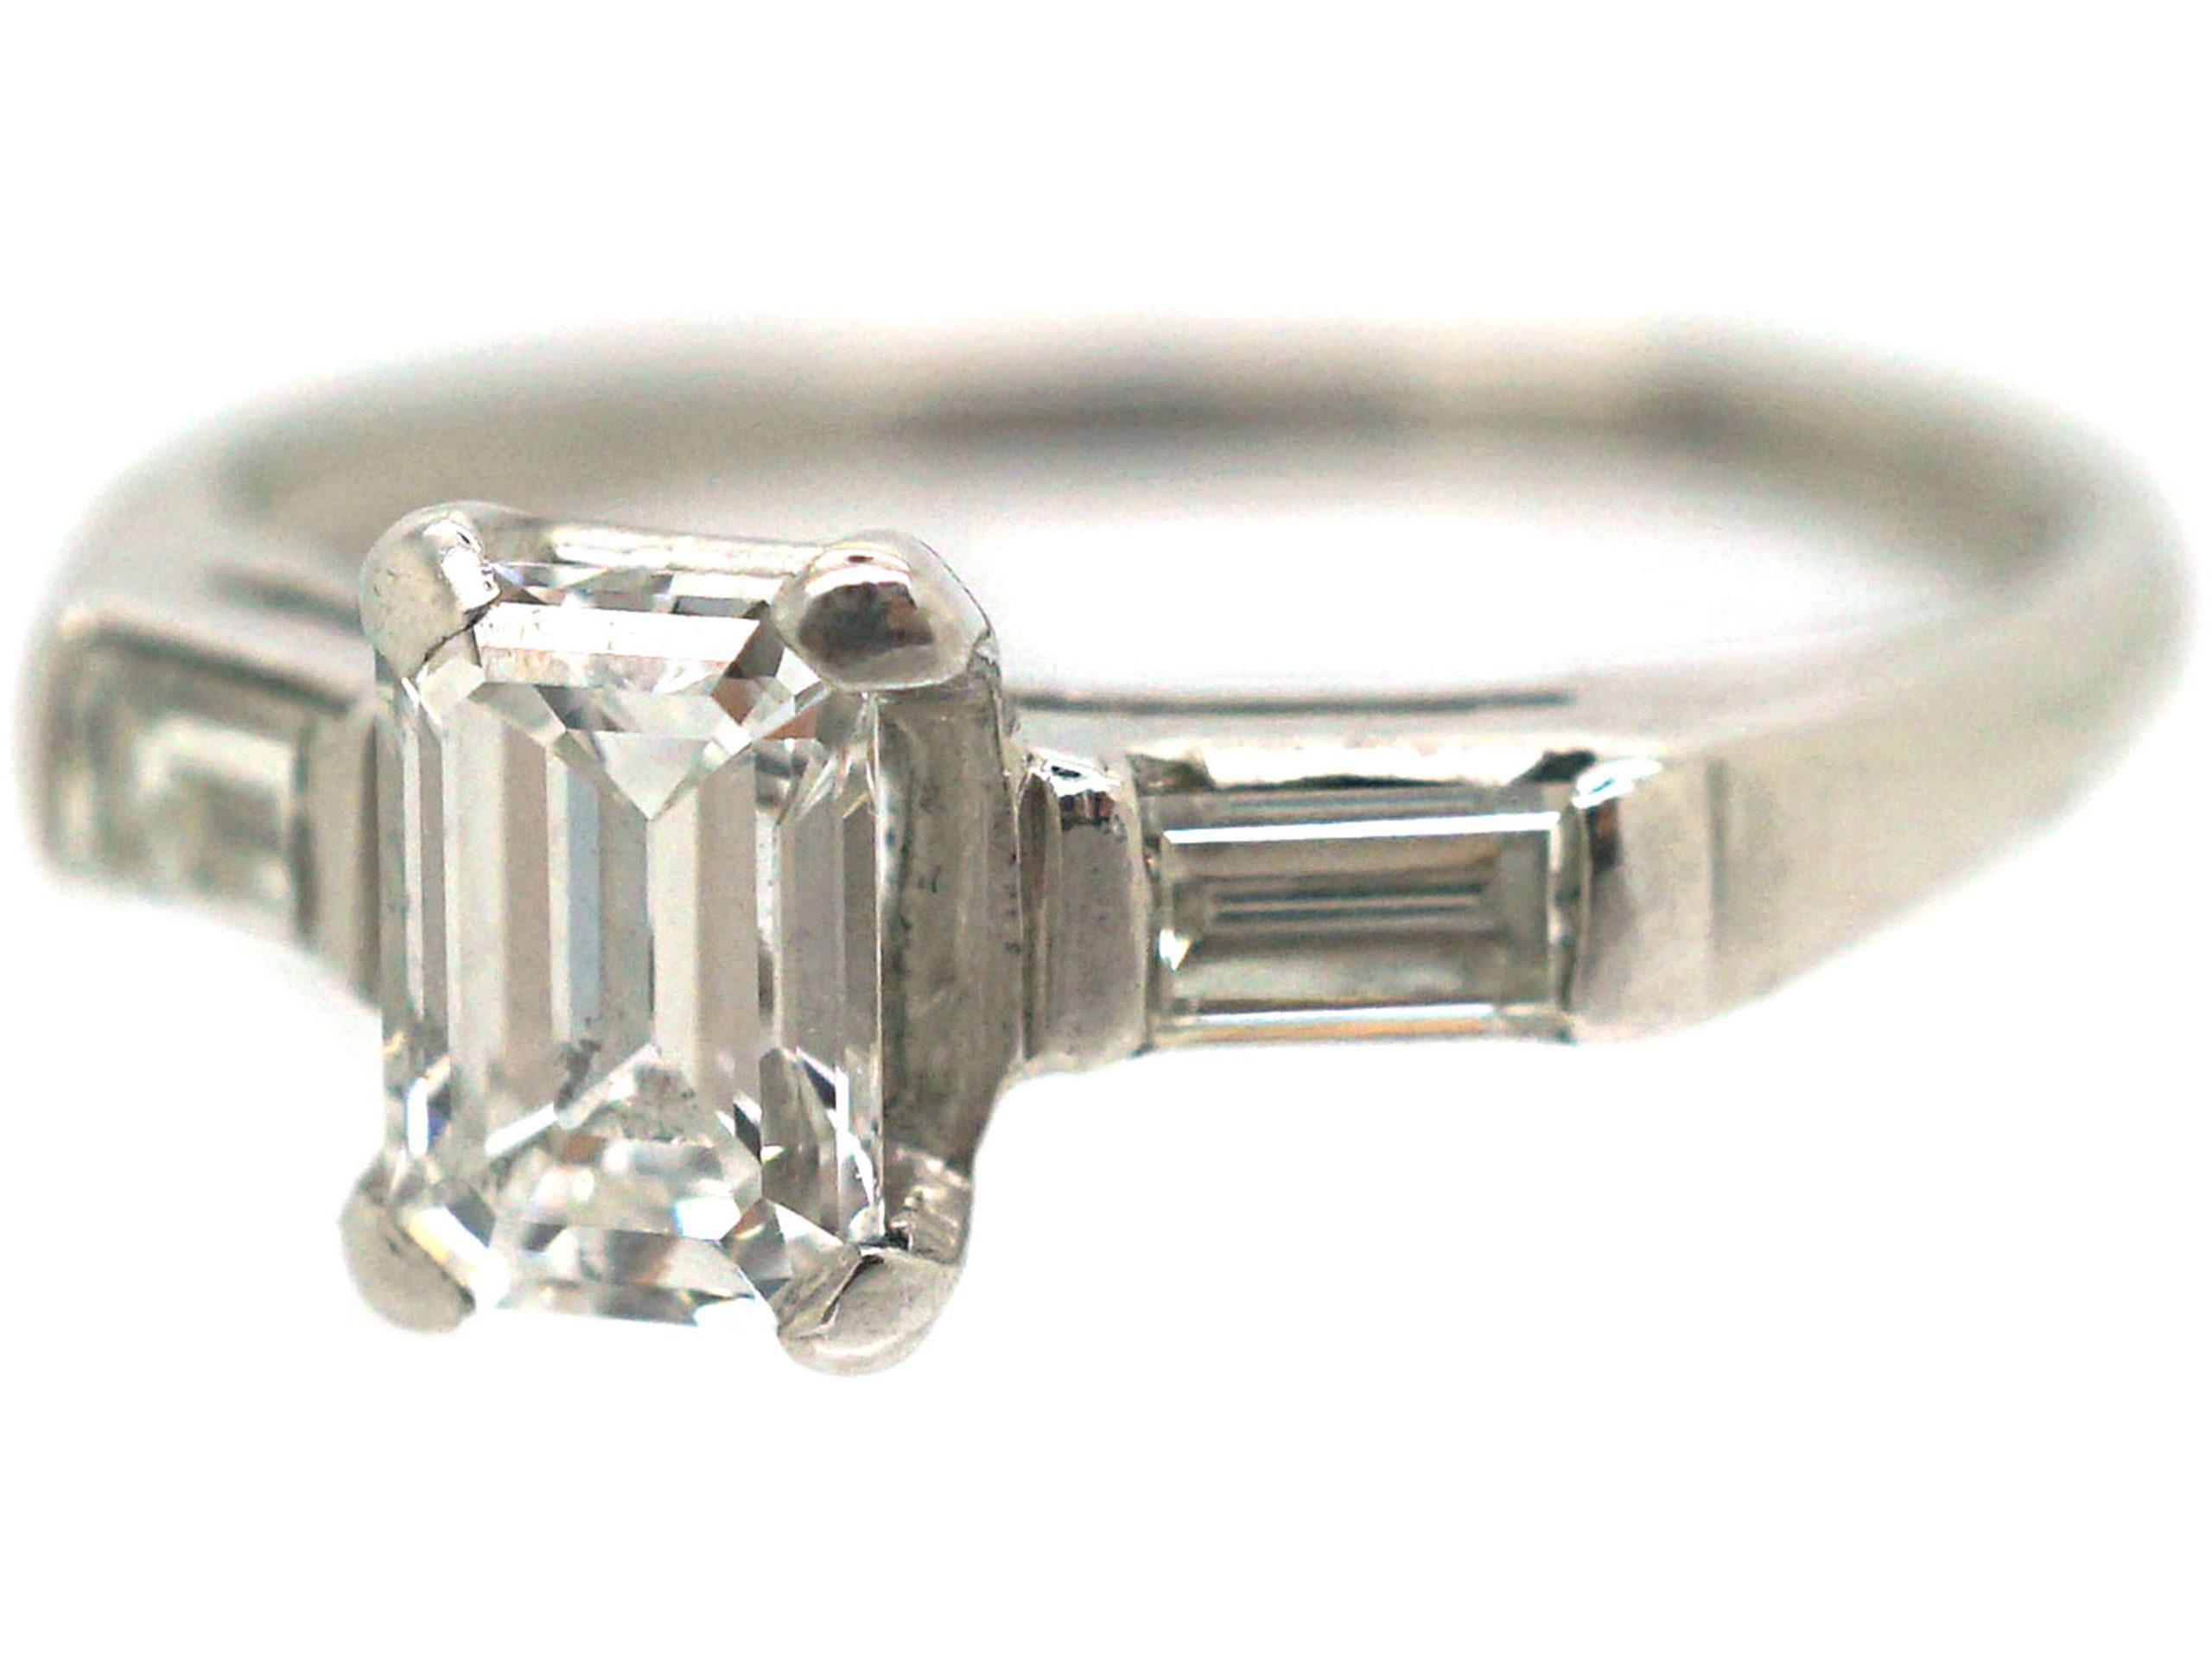 Art Deco Platinum, Emerald Cut & Baguette Cut Diamond Ring